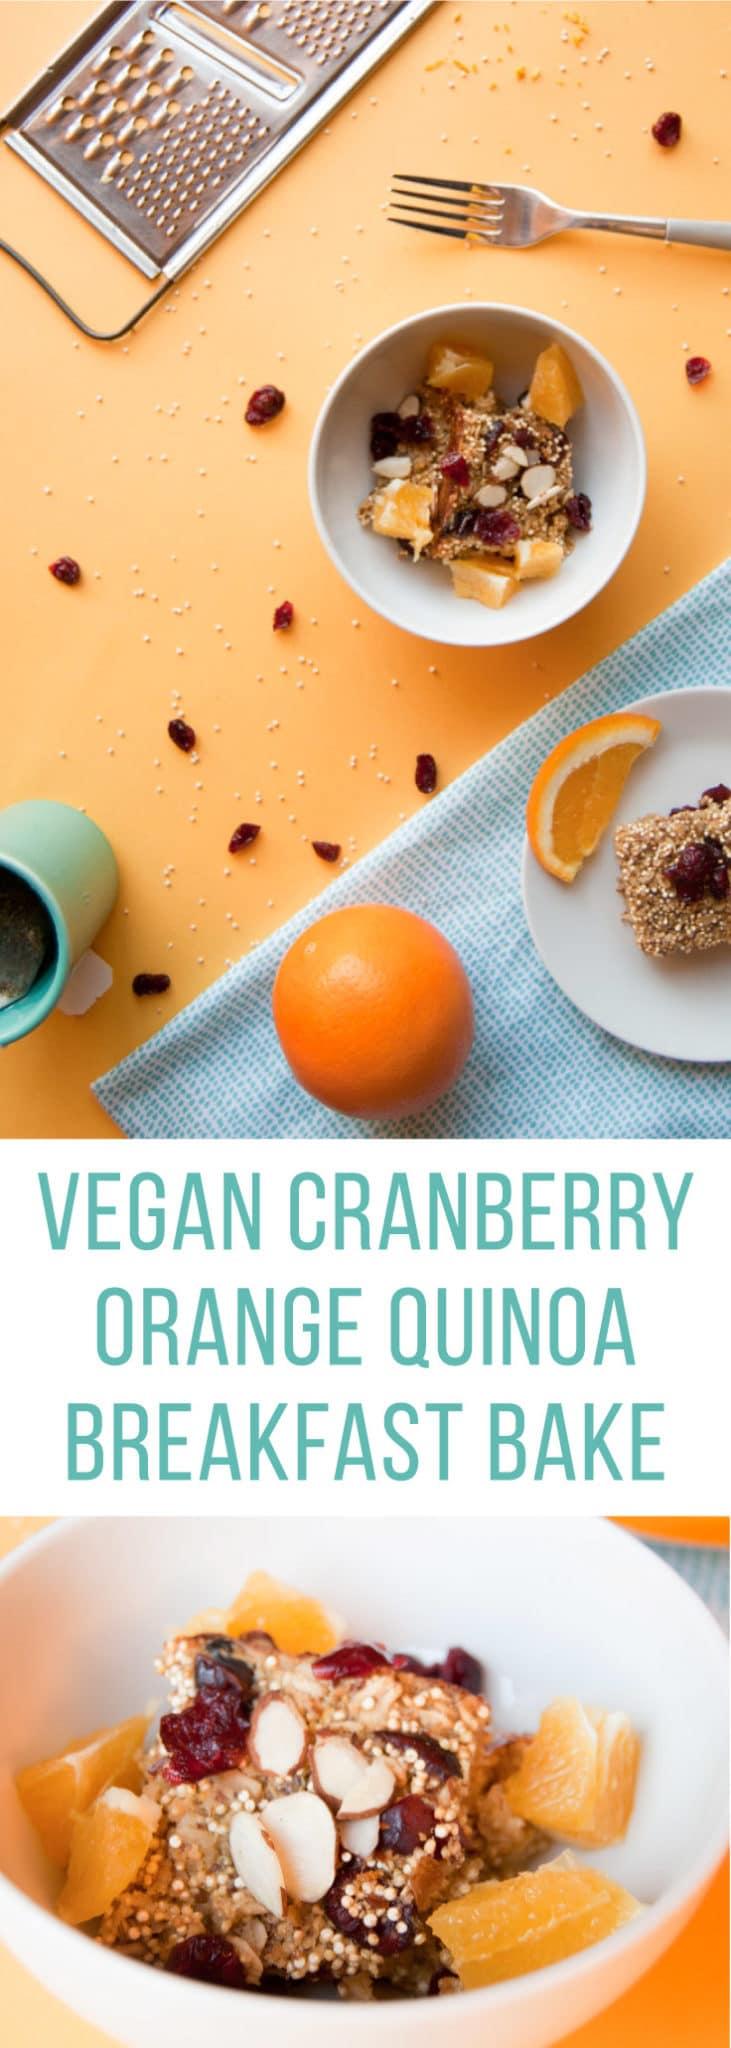 Cranberry Orange Quinoa Breakfast Bake -- Start your day right with this vegan gluten free breakfast recipe. | mindfulavocado